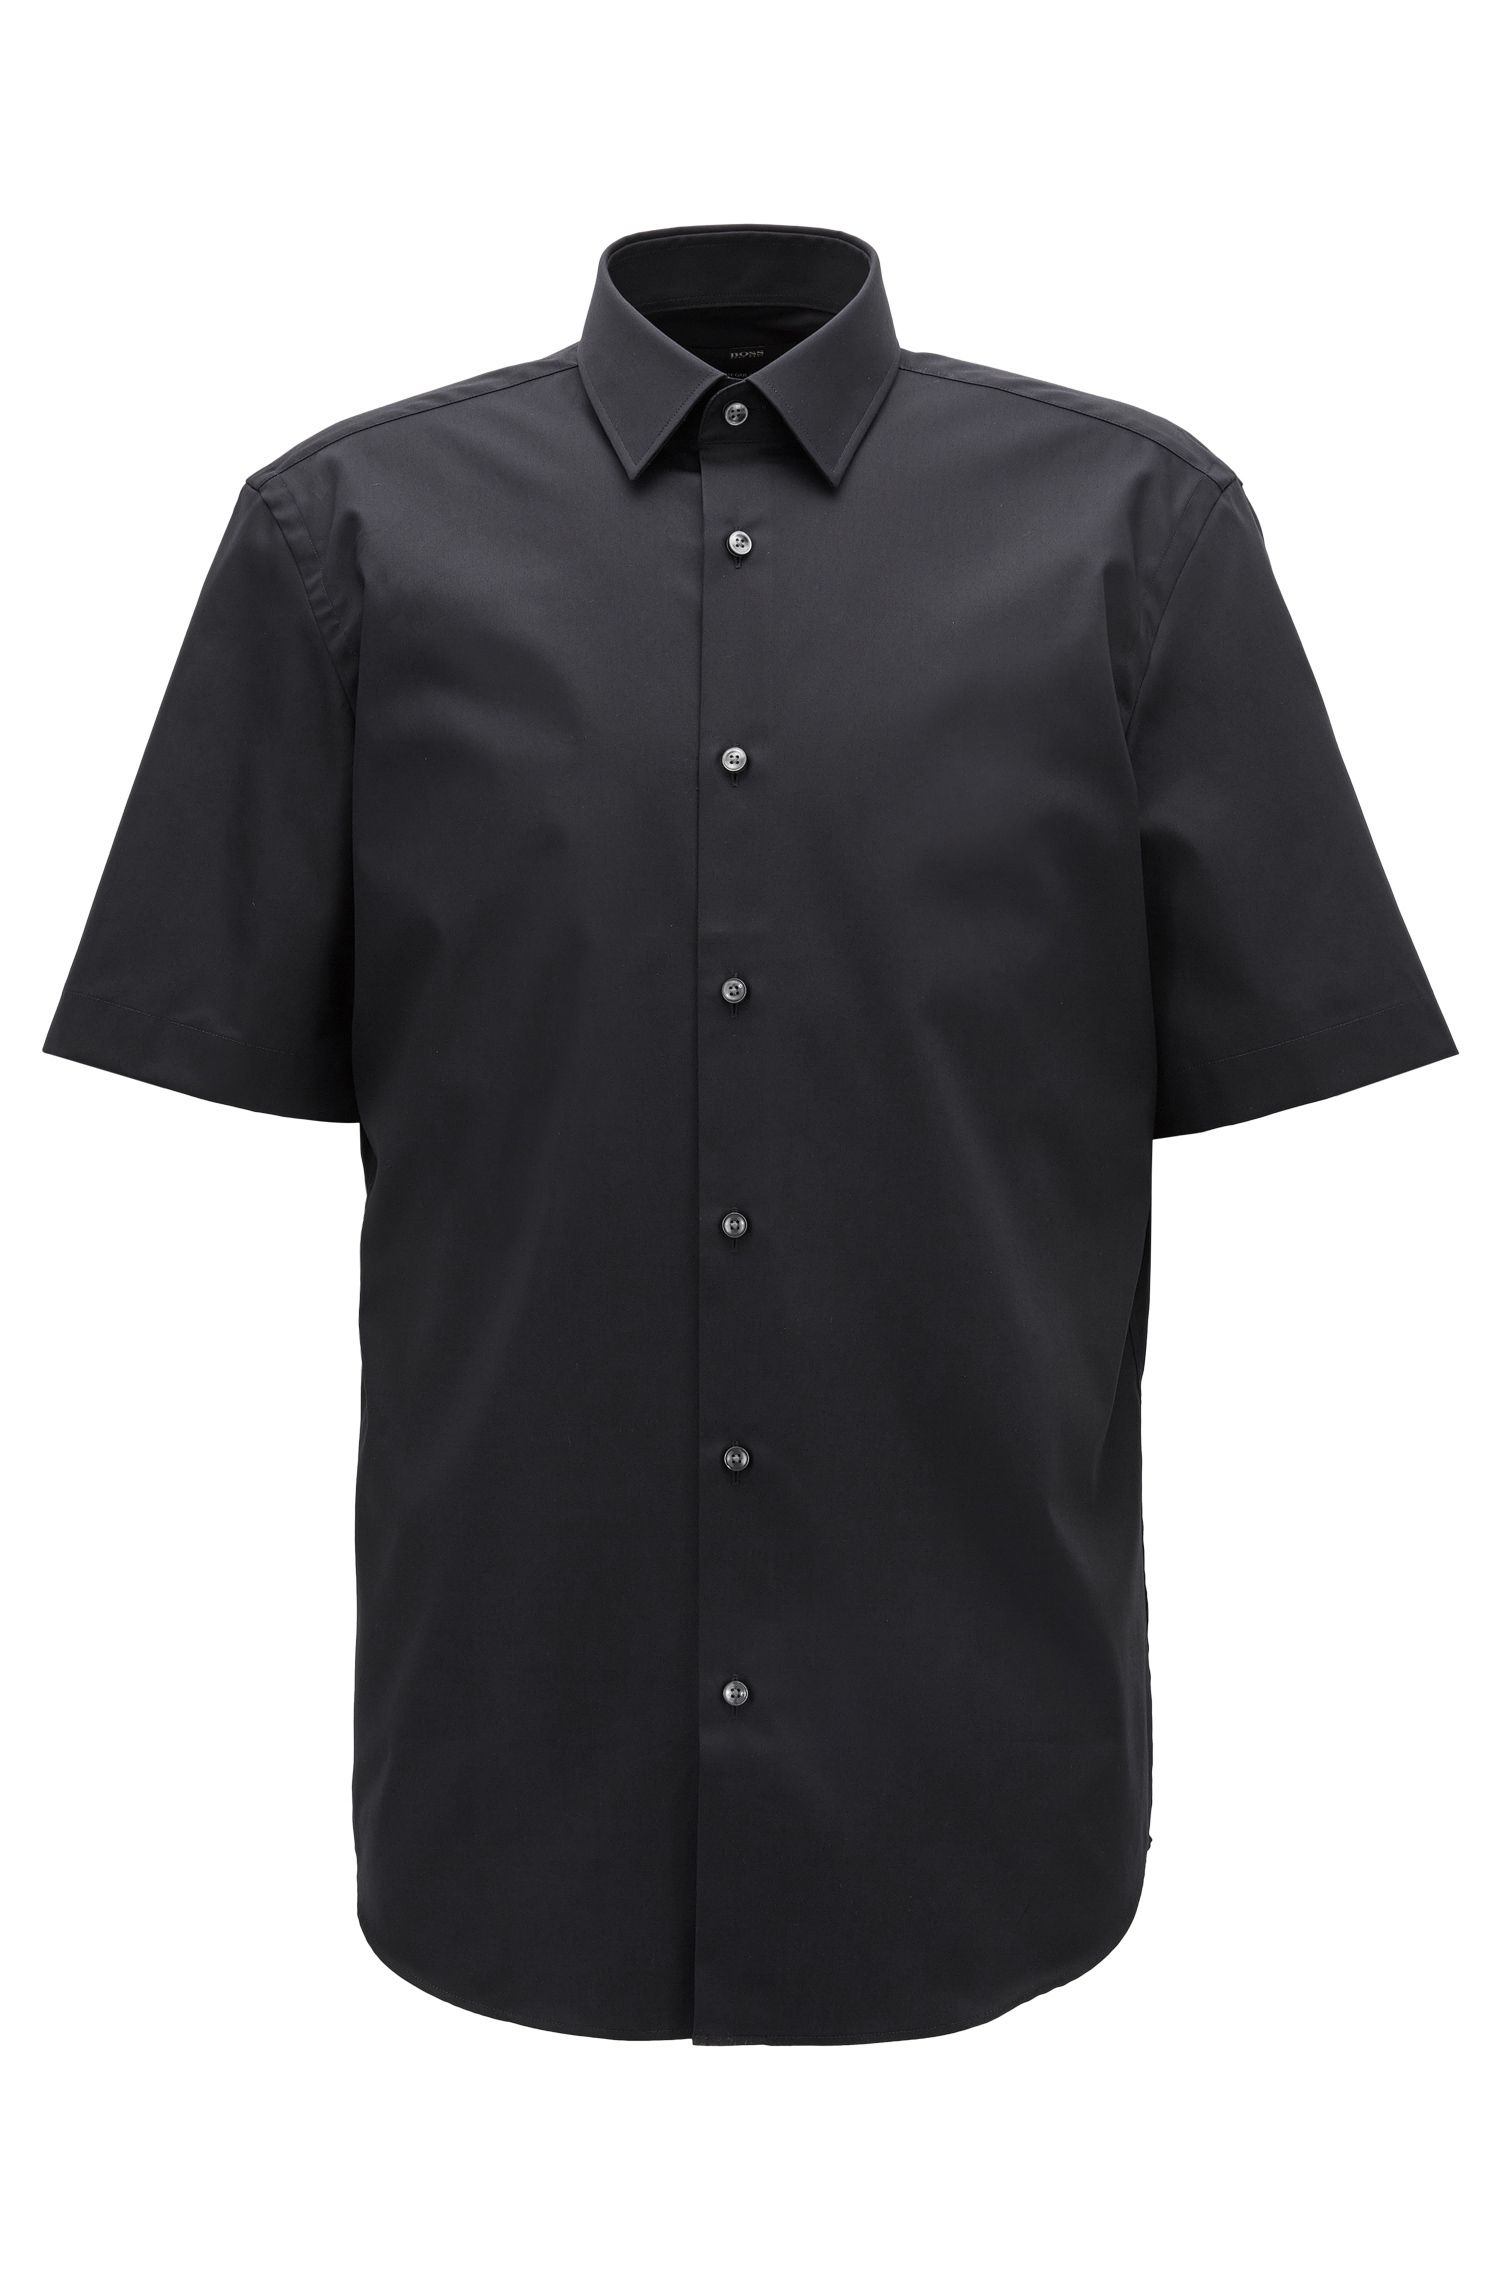 Short-sleeved easy-iron cotton poplin shirt